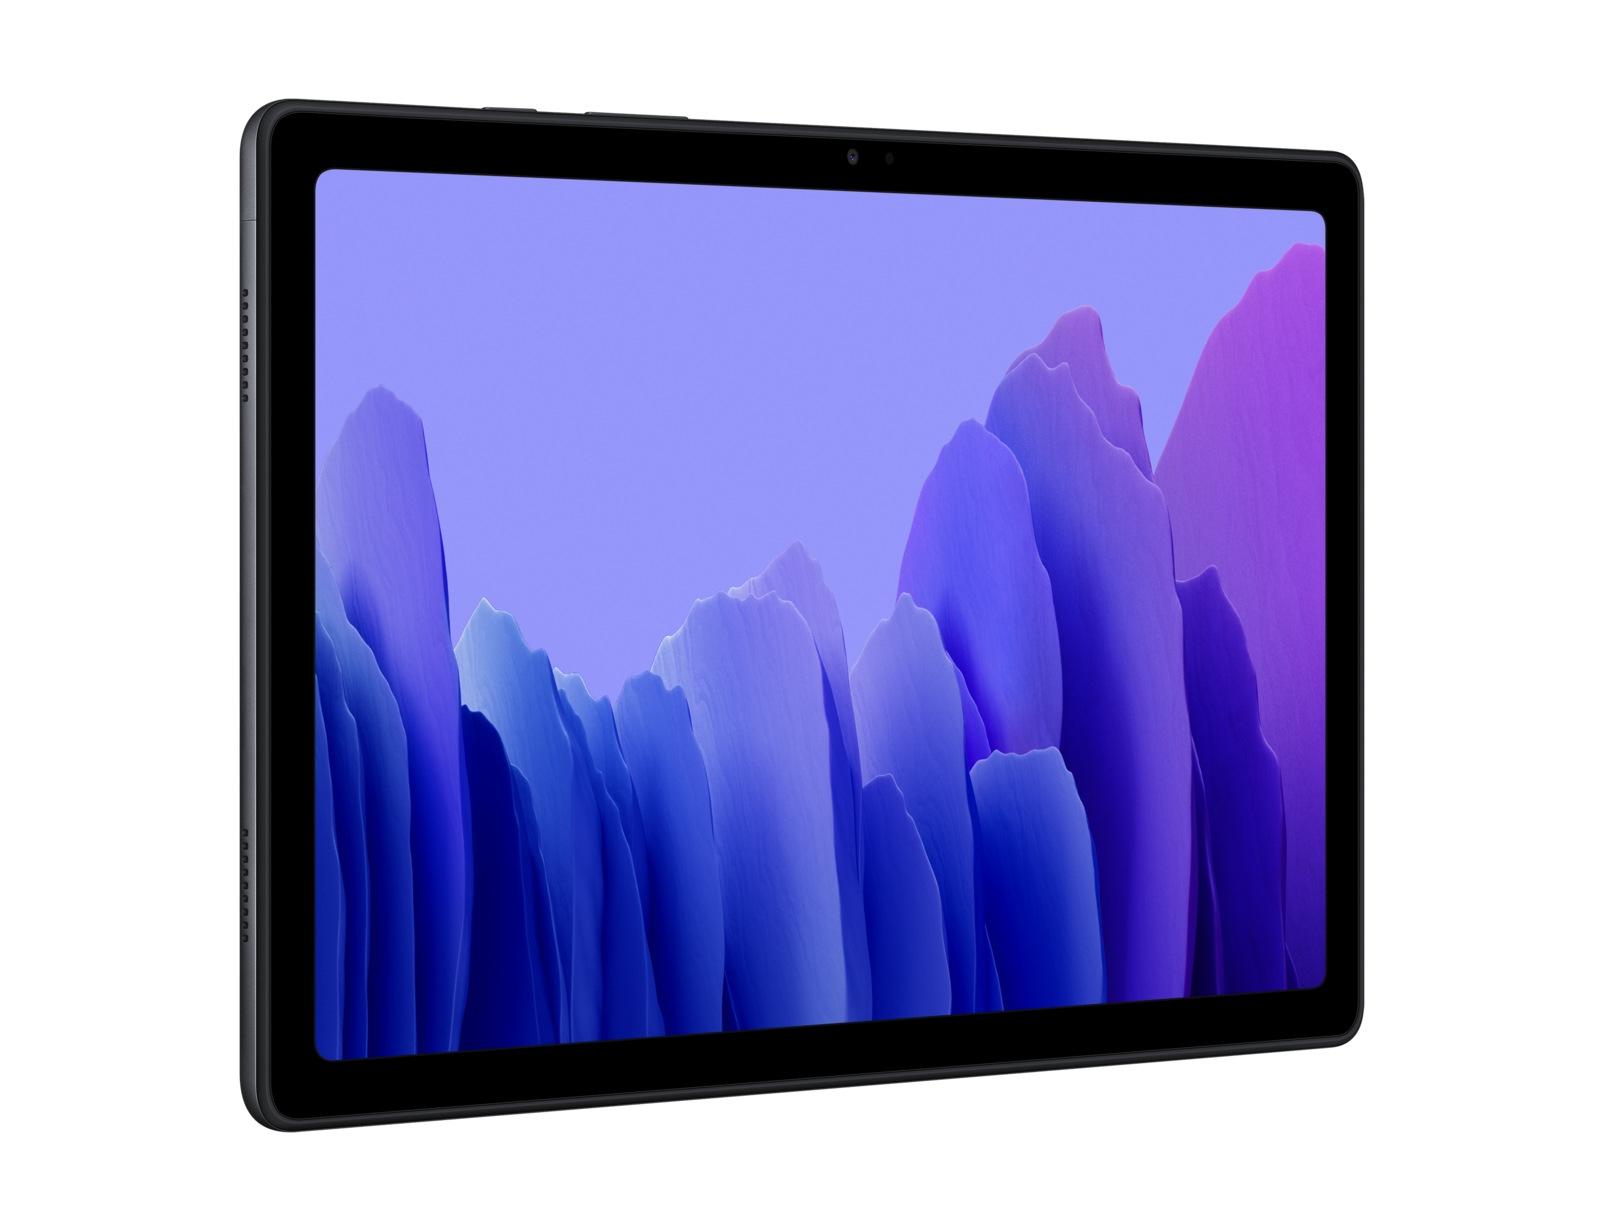 Samsung Galaxy Tab A7 - Tablet, Android 1 32 GB, 26.31 cm (10.4 inc) , Wi-Fi (2020) 32GB Grijs